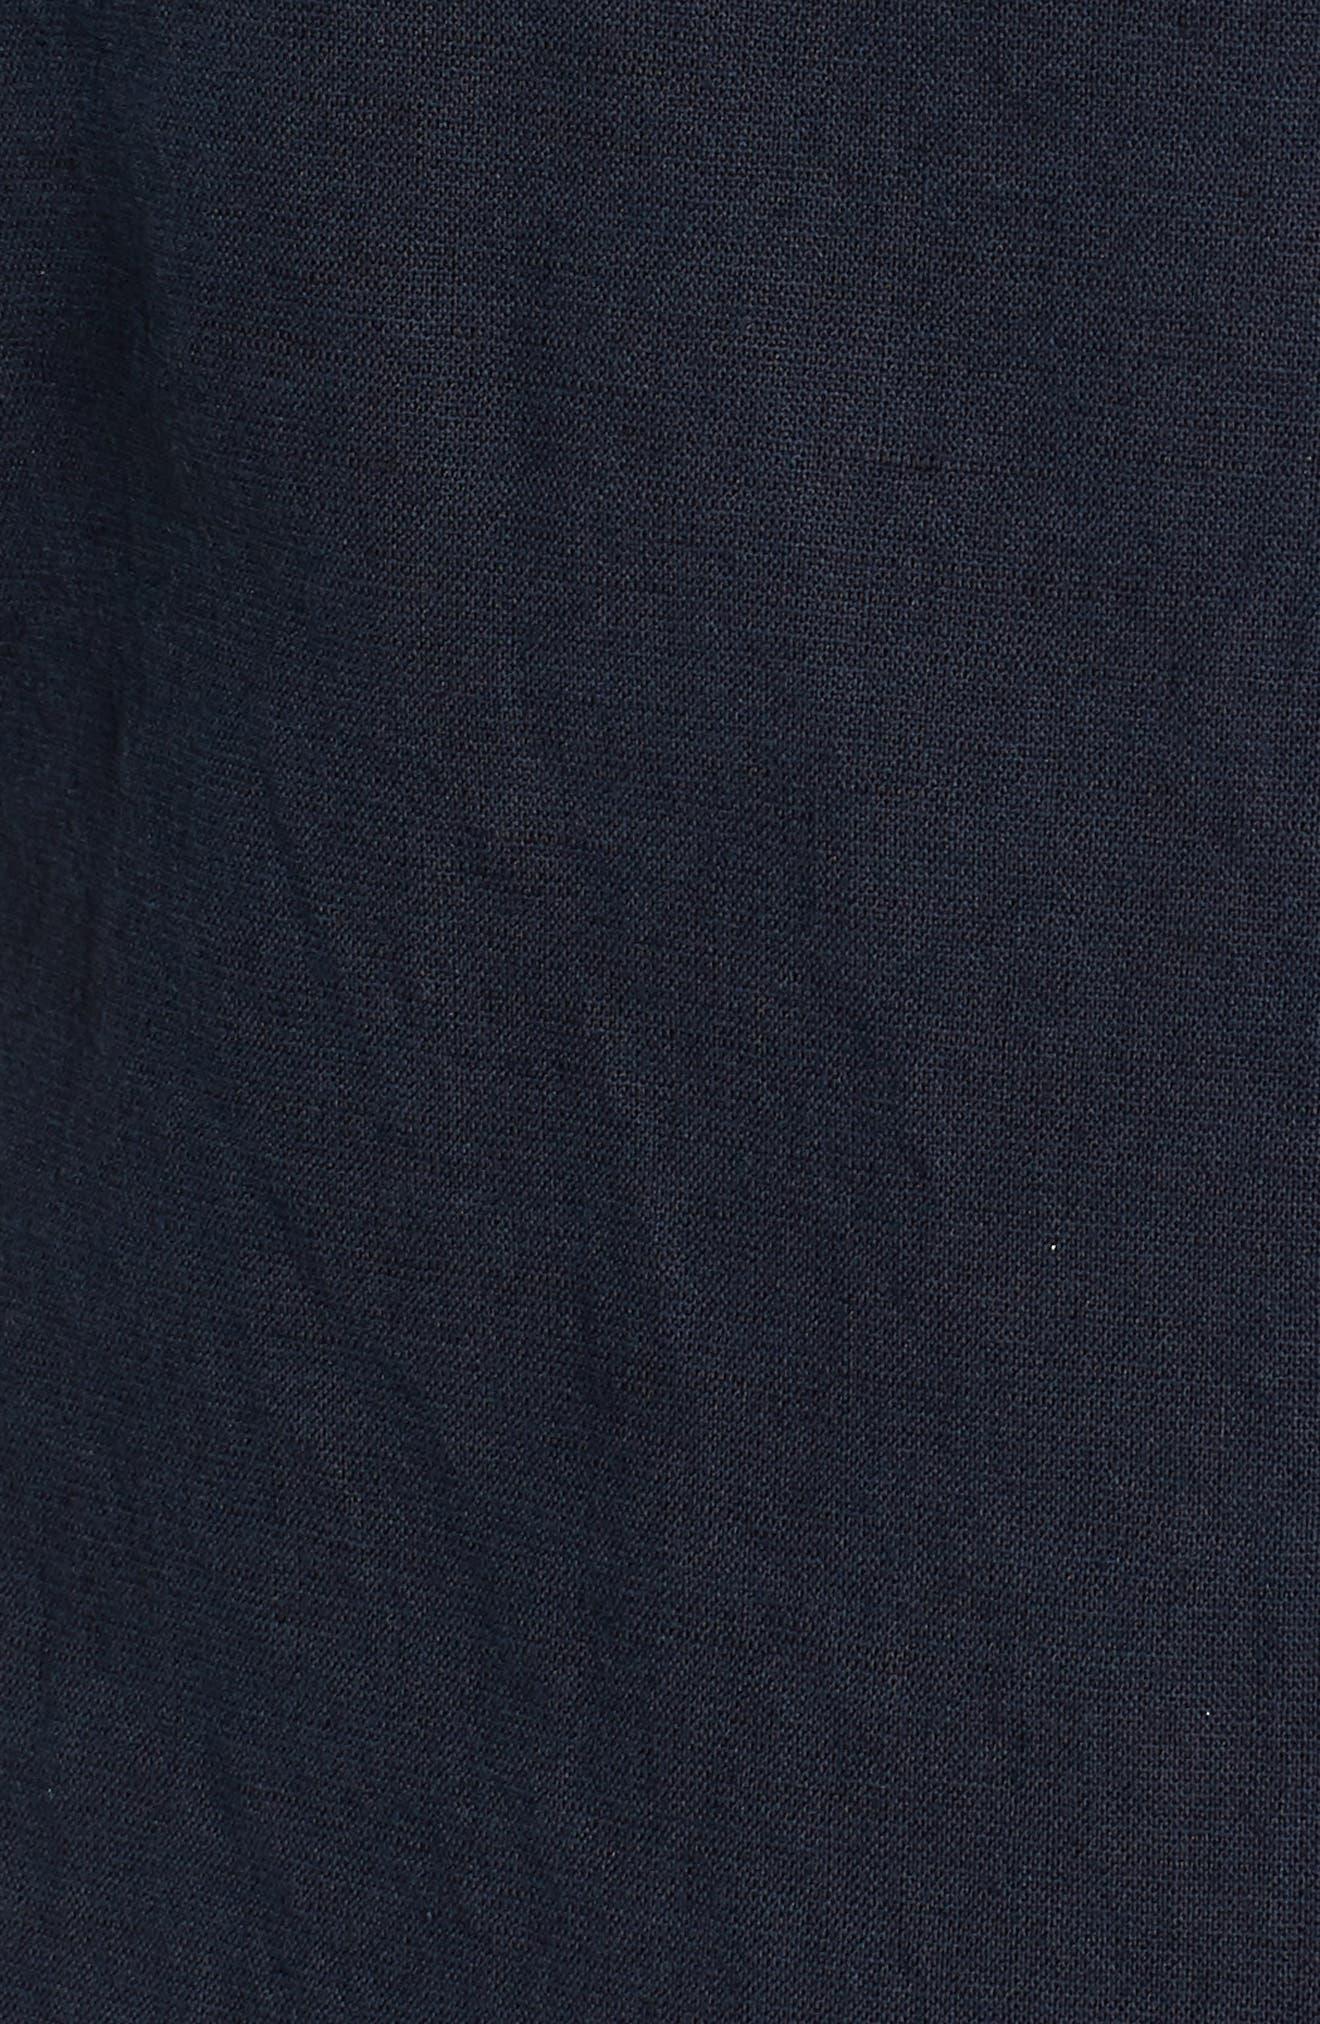 Darcy Tie Back Jumpsuit,                             Alternate thumbnail 6, color,                             Sulfur Dark Cove